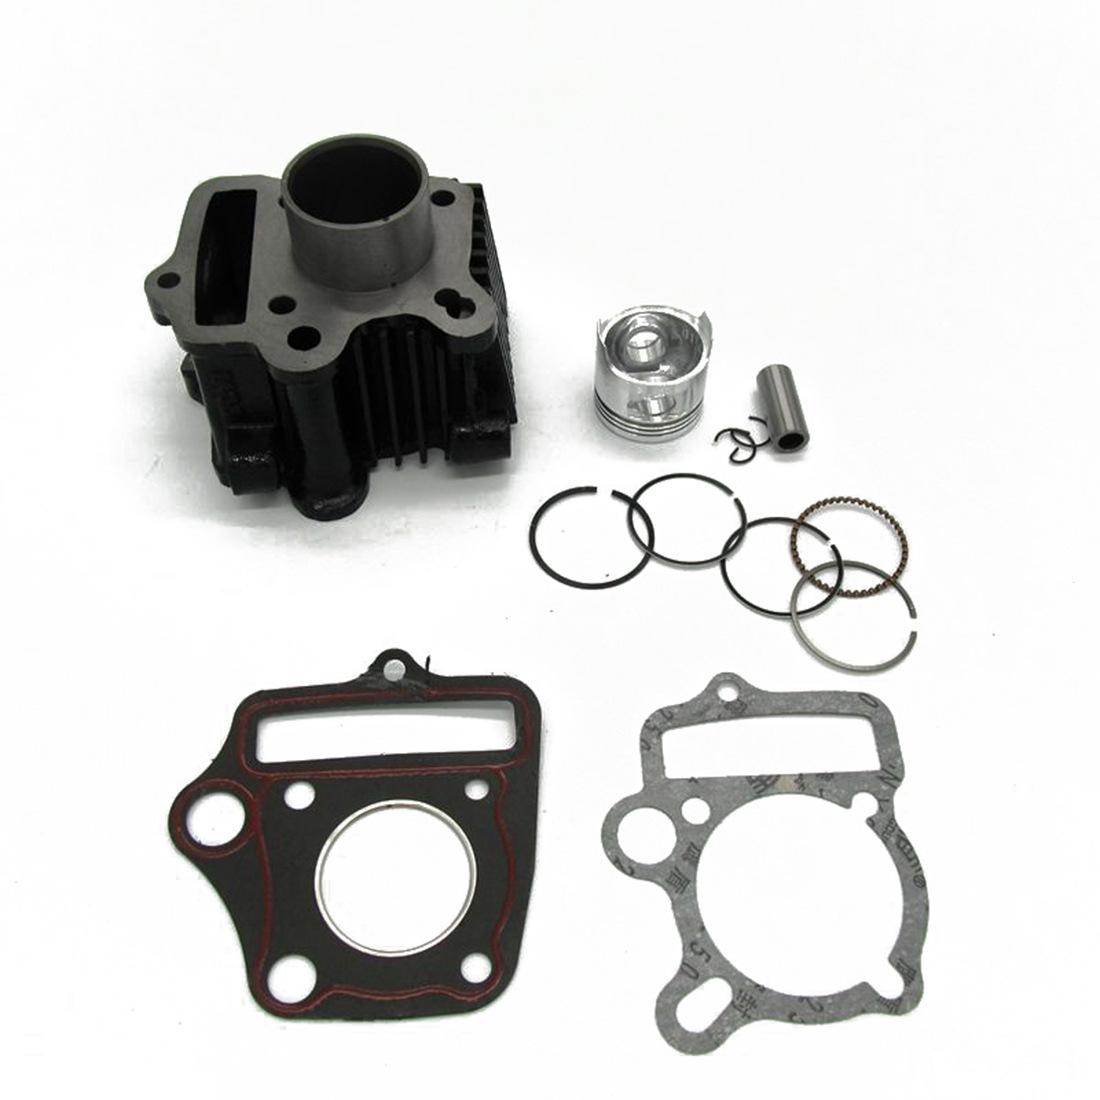 Cylinder Piston Kit 50cc ATV Quad Four Wheeler Dirt Pit Bike Engine Parts